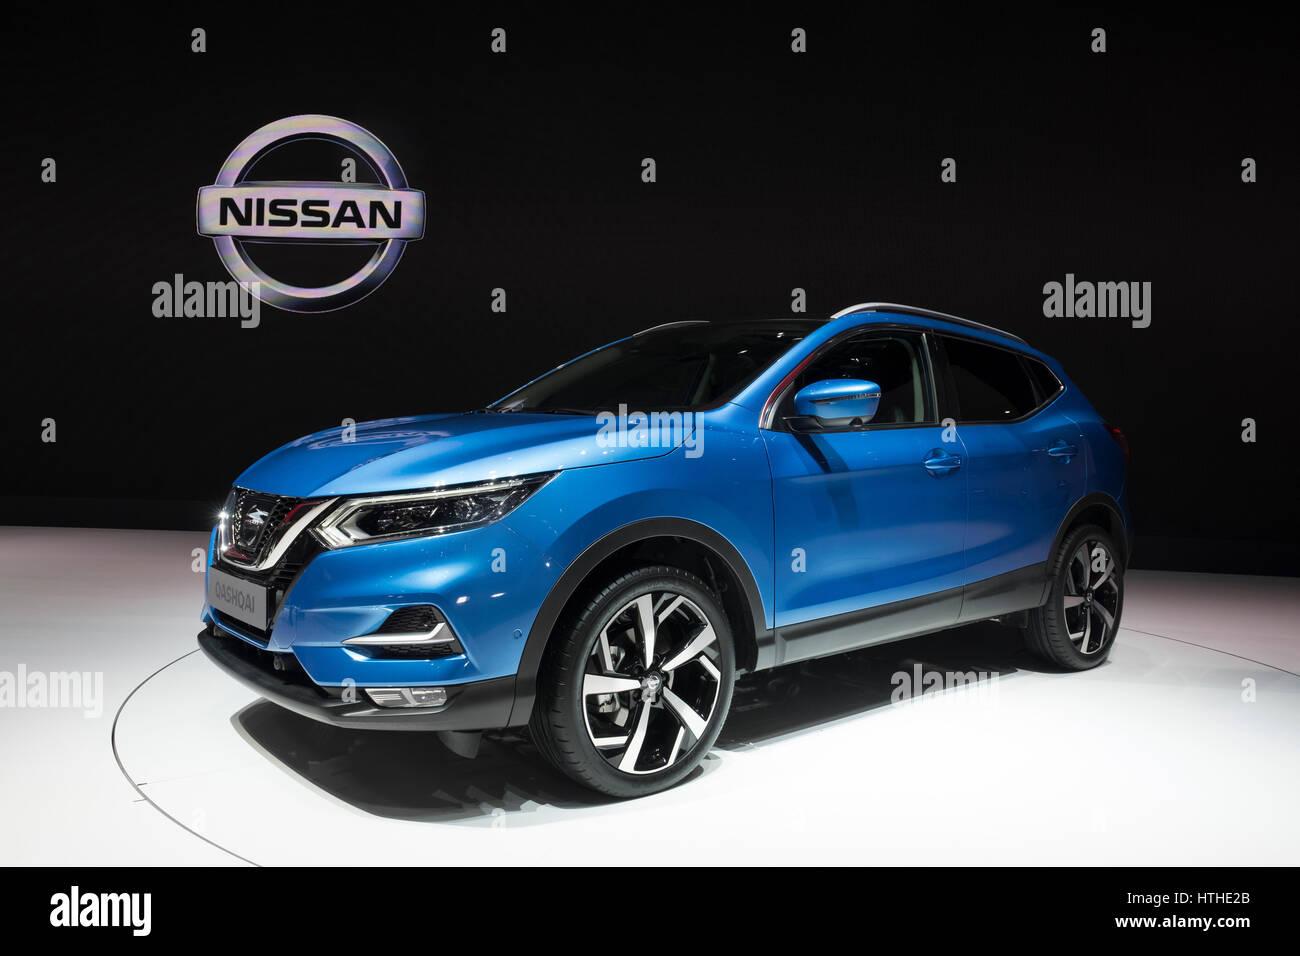 New 2018 facelift design of Nissan Qashqai at 87th Geneva International Motor Show in Geneva Switzerland 2017 - Stock Image